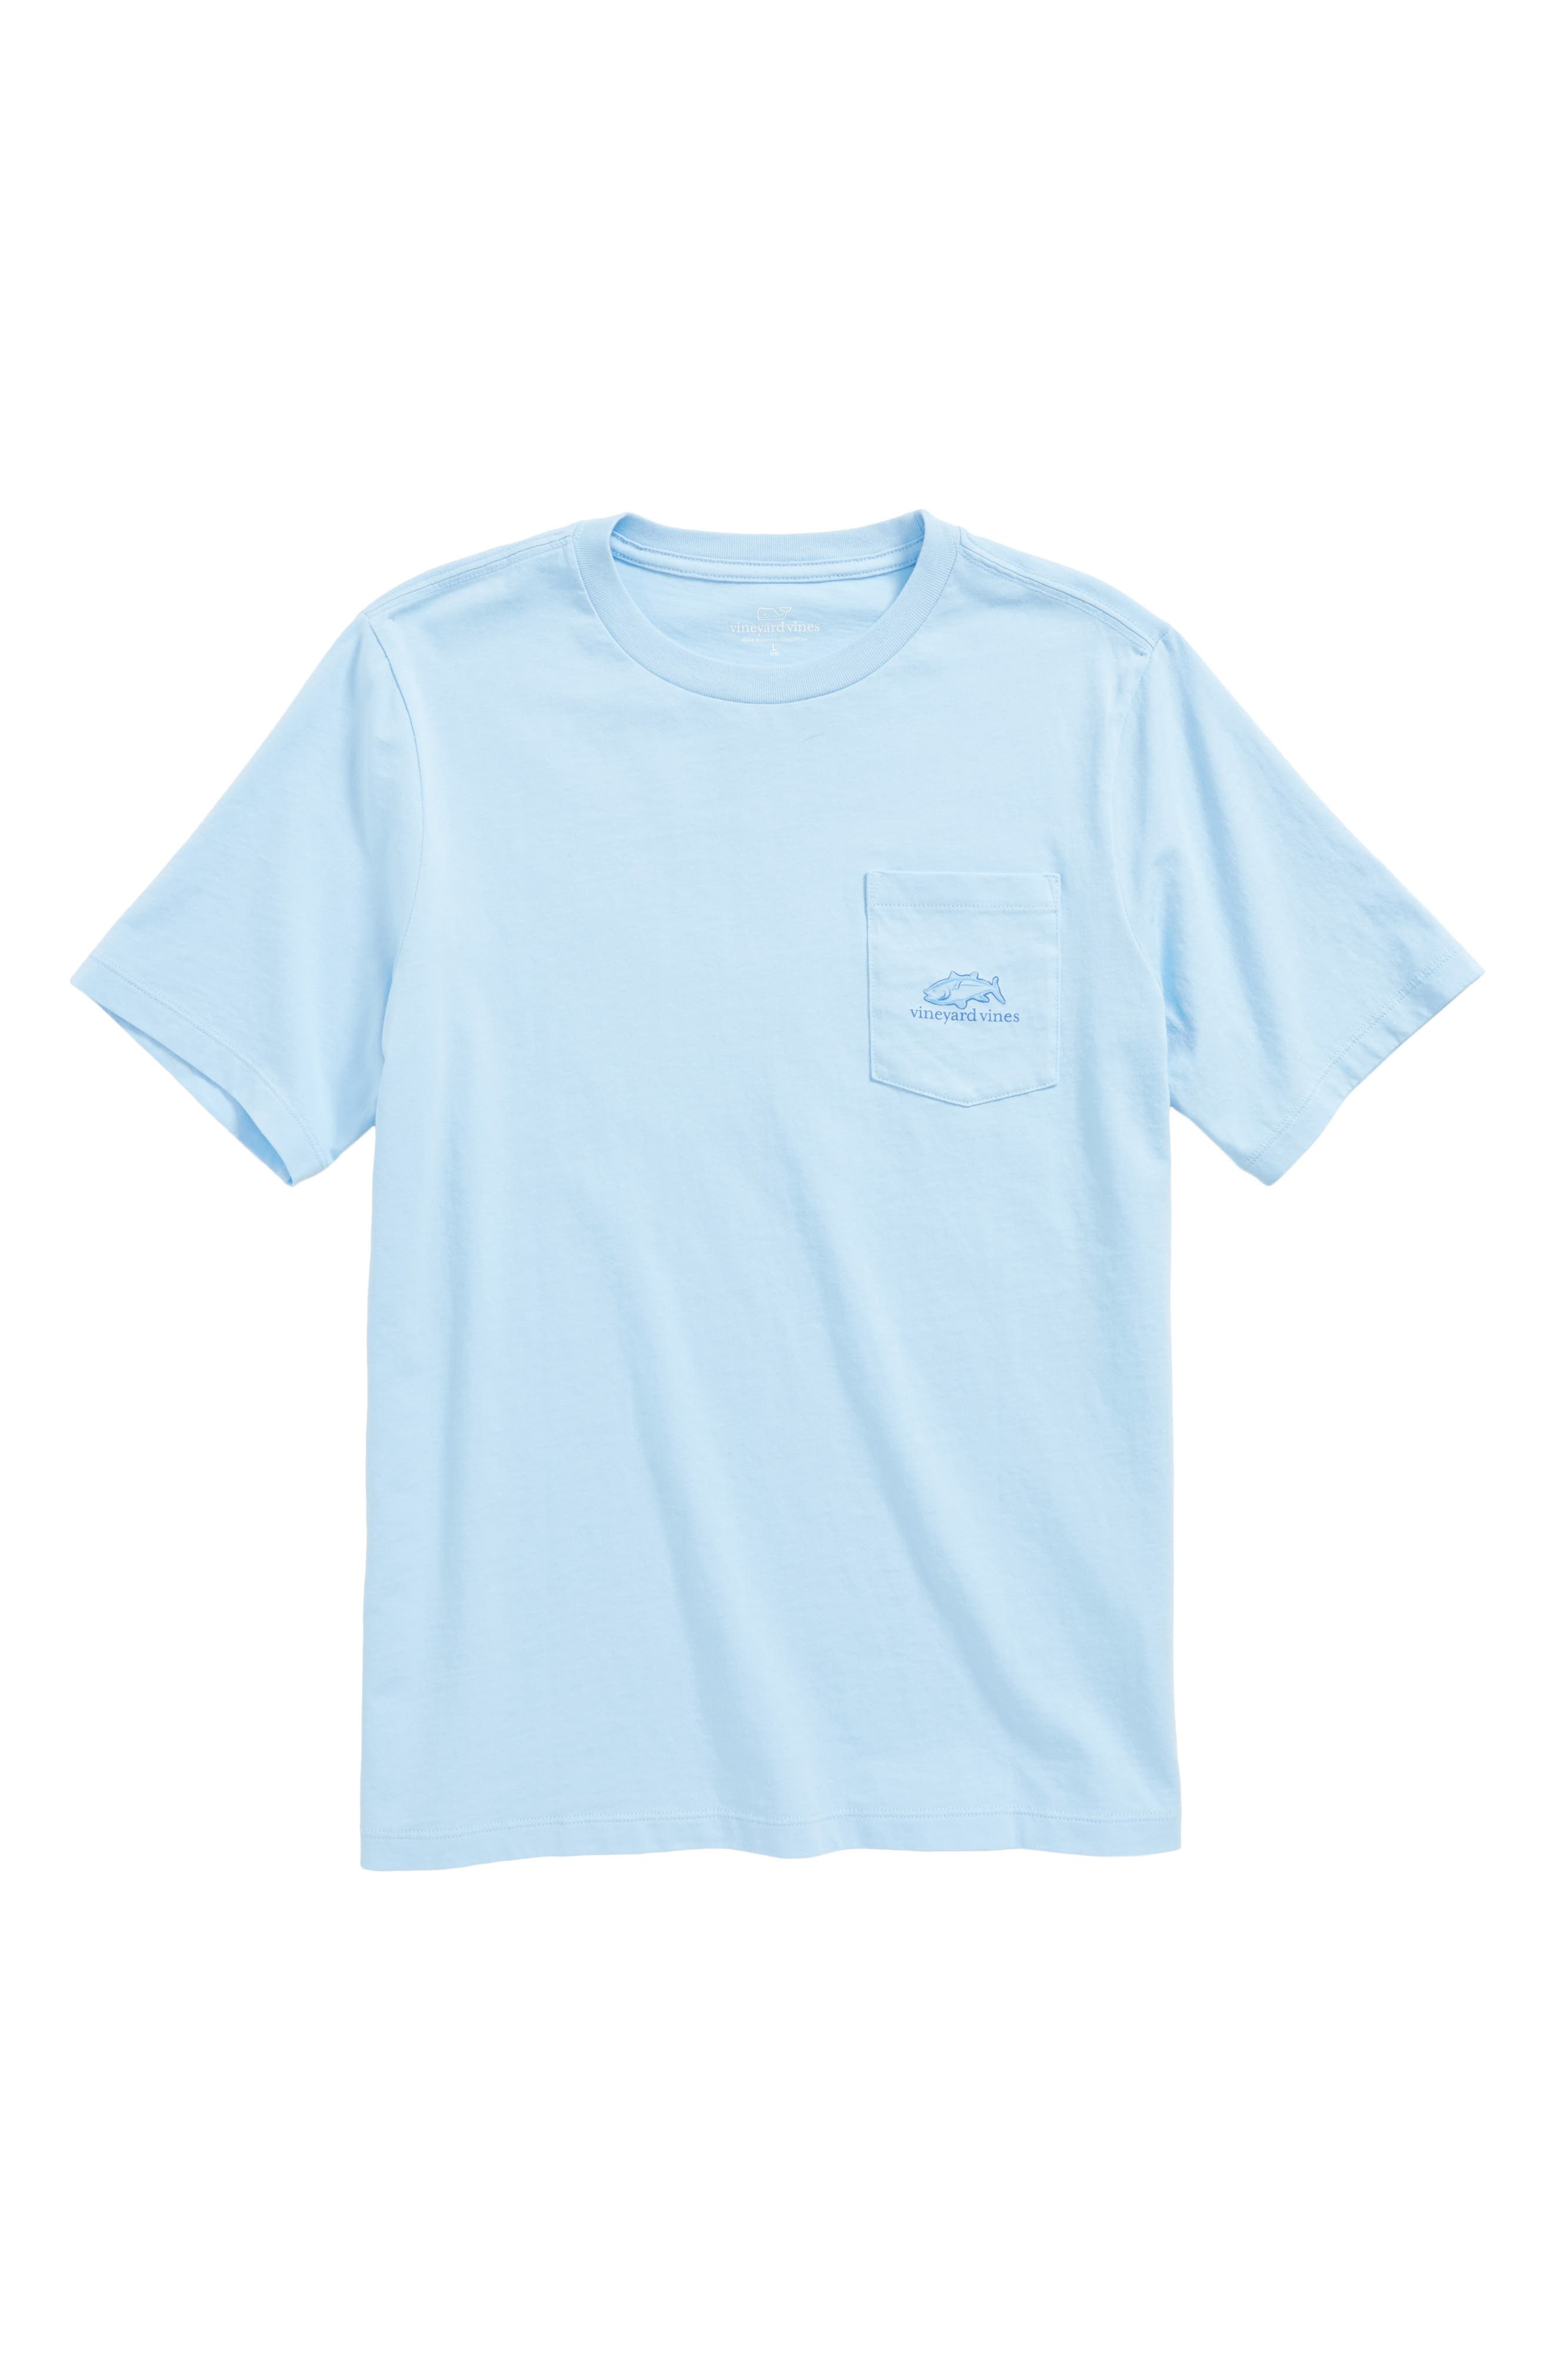 Main Image - vineyard vines Tuna in Coral Whale Pocket T-Shirt (Big Boys)